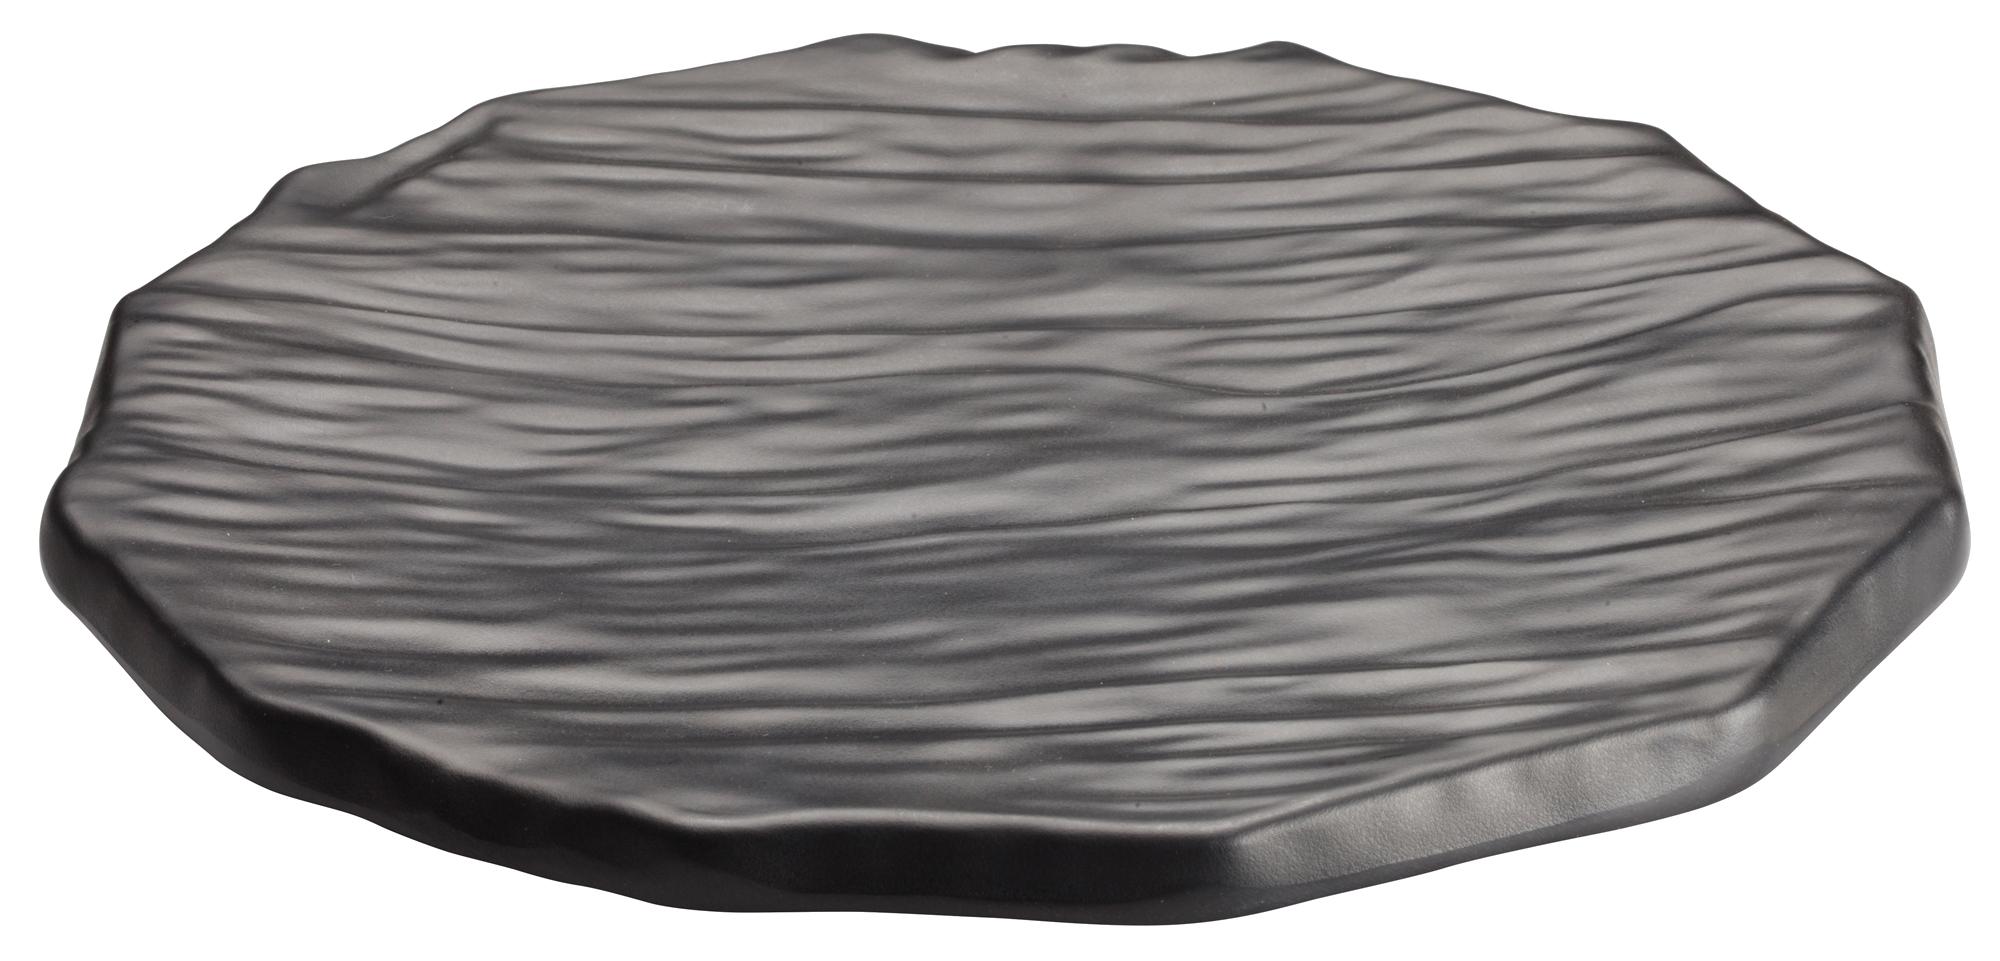 Winco WDM019-301 platter, plastic